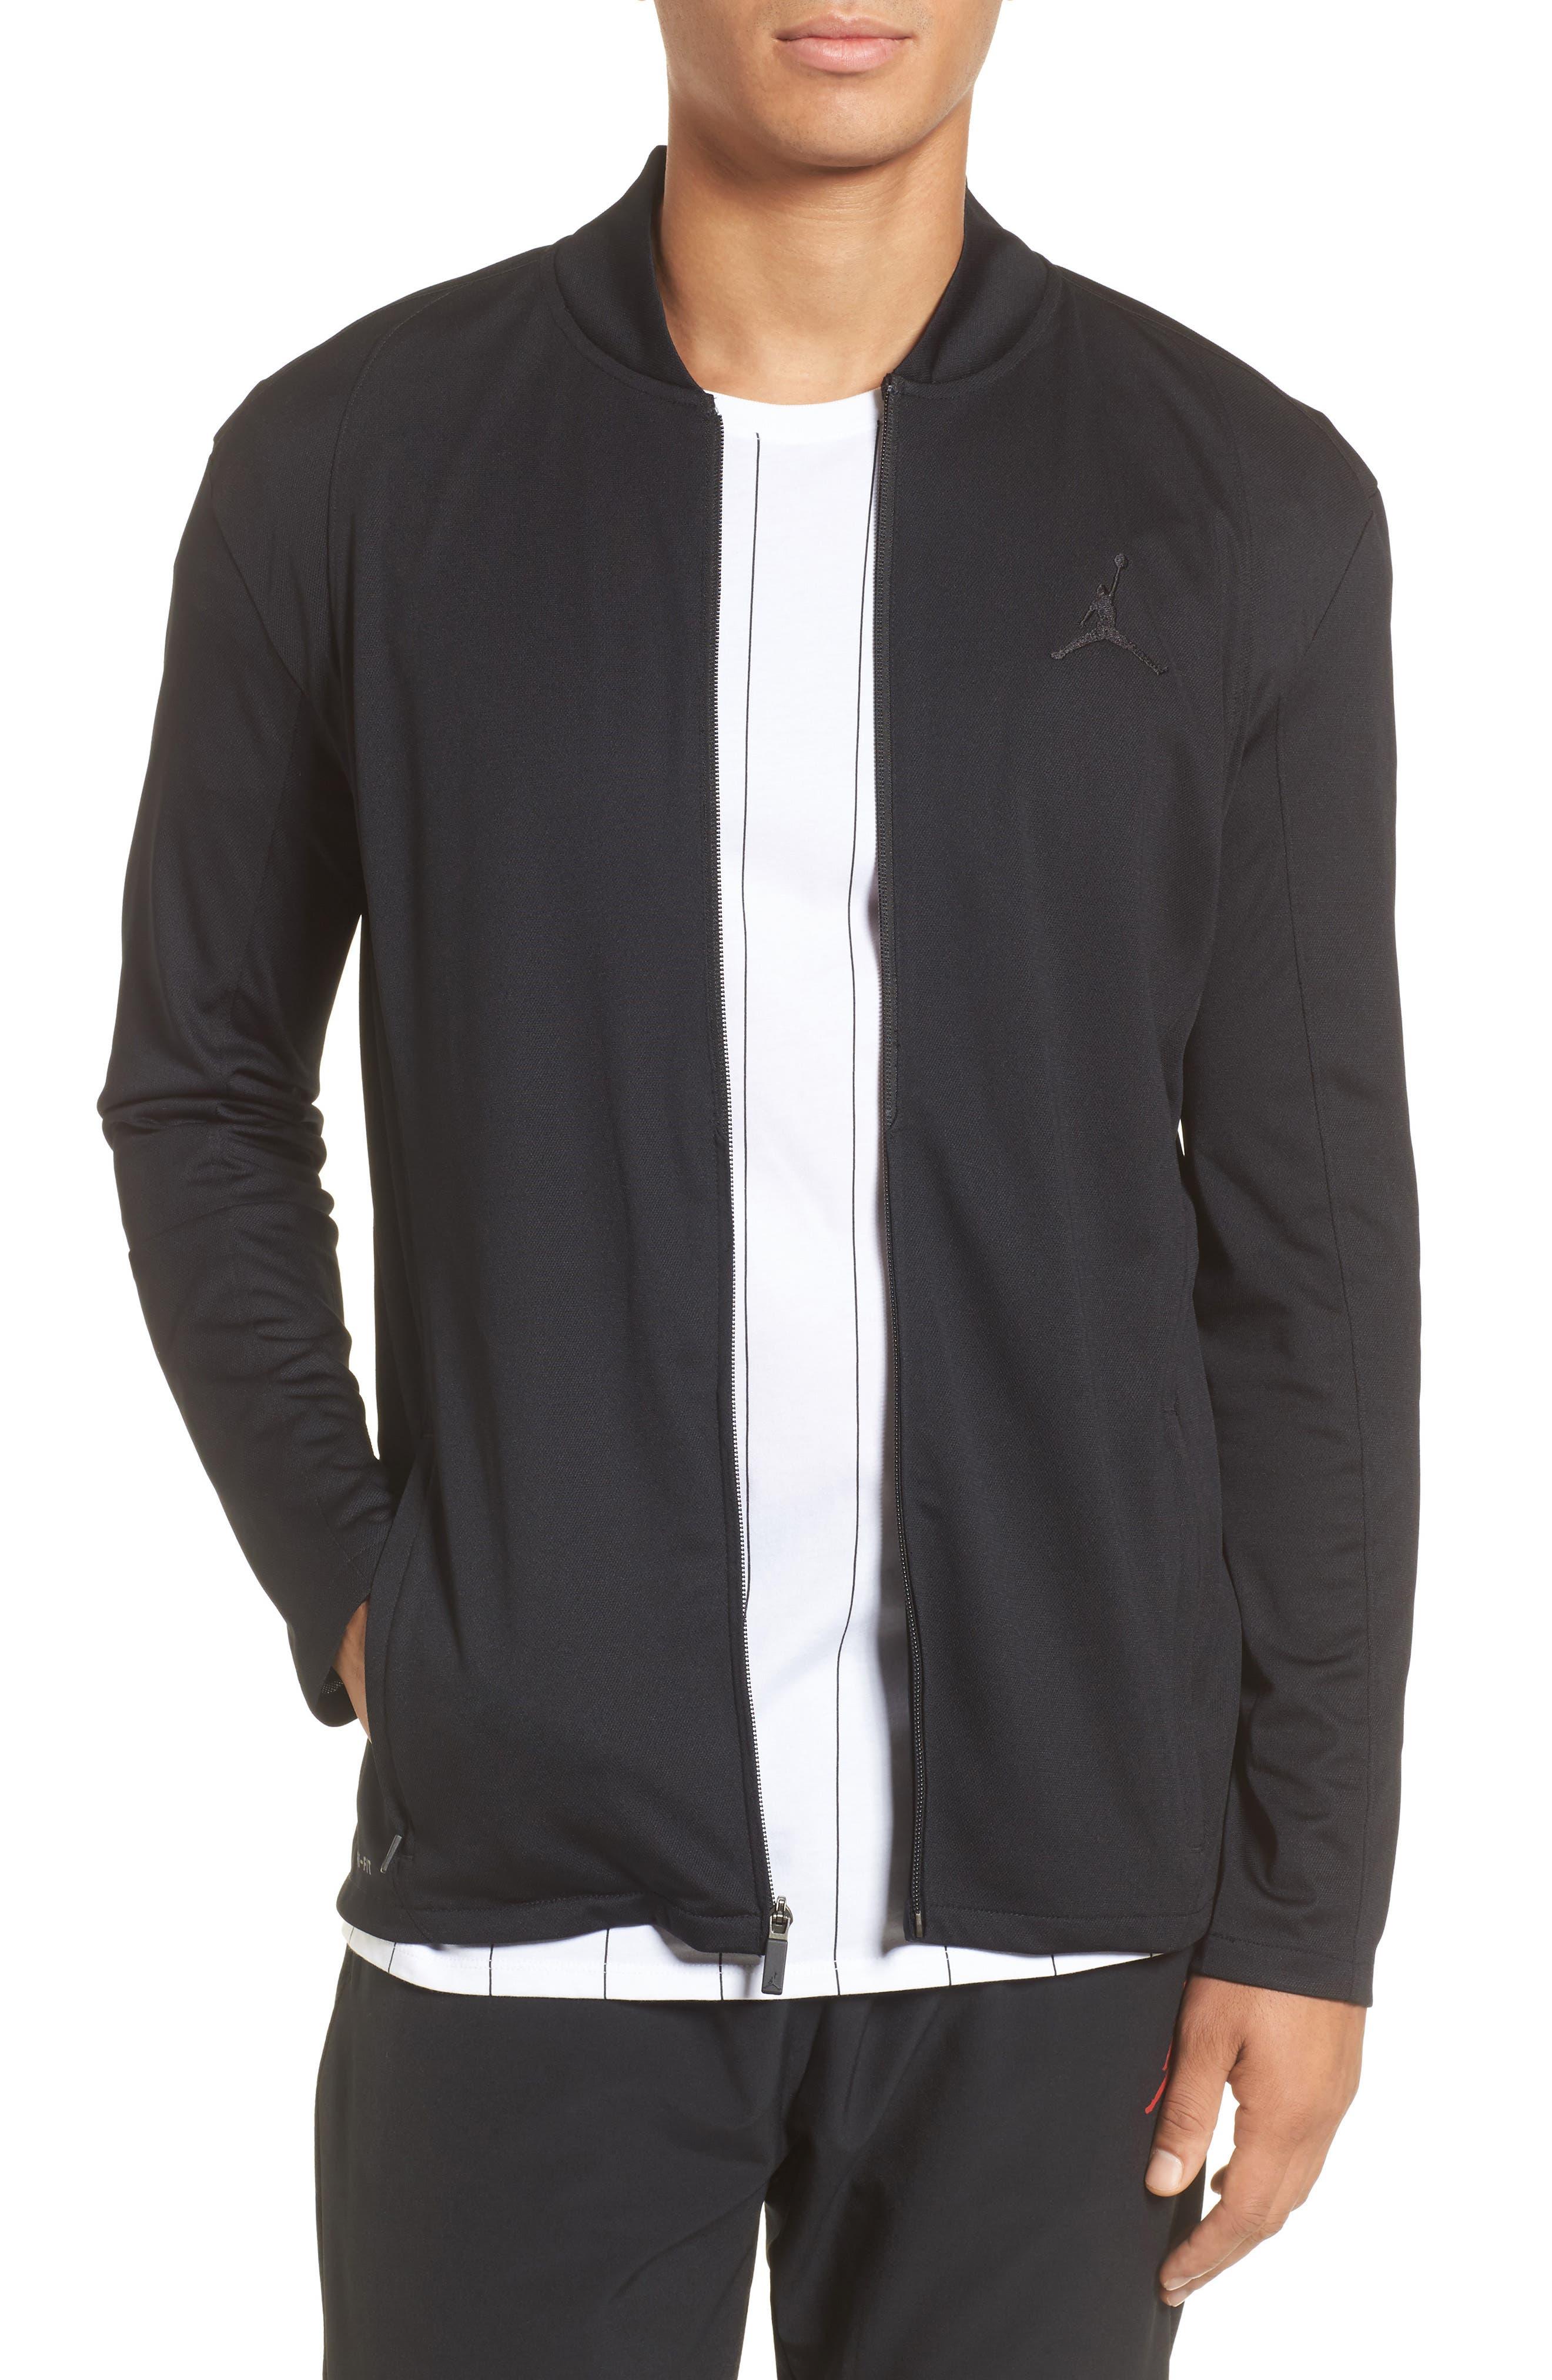 Ultimate Flight Zip Jacket,                         Main,                         color, Black/ Black